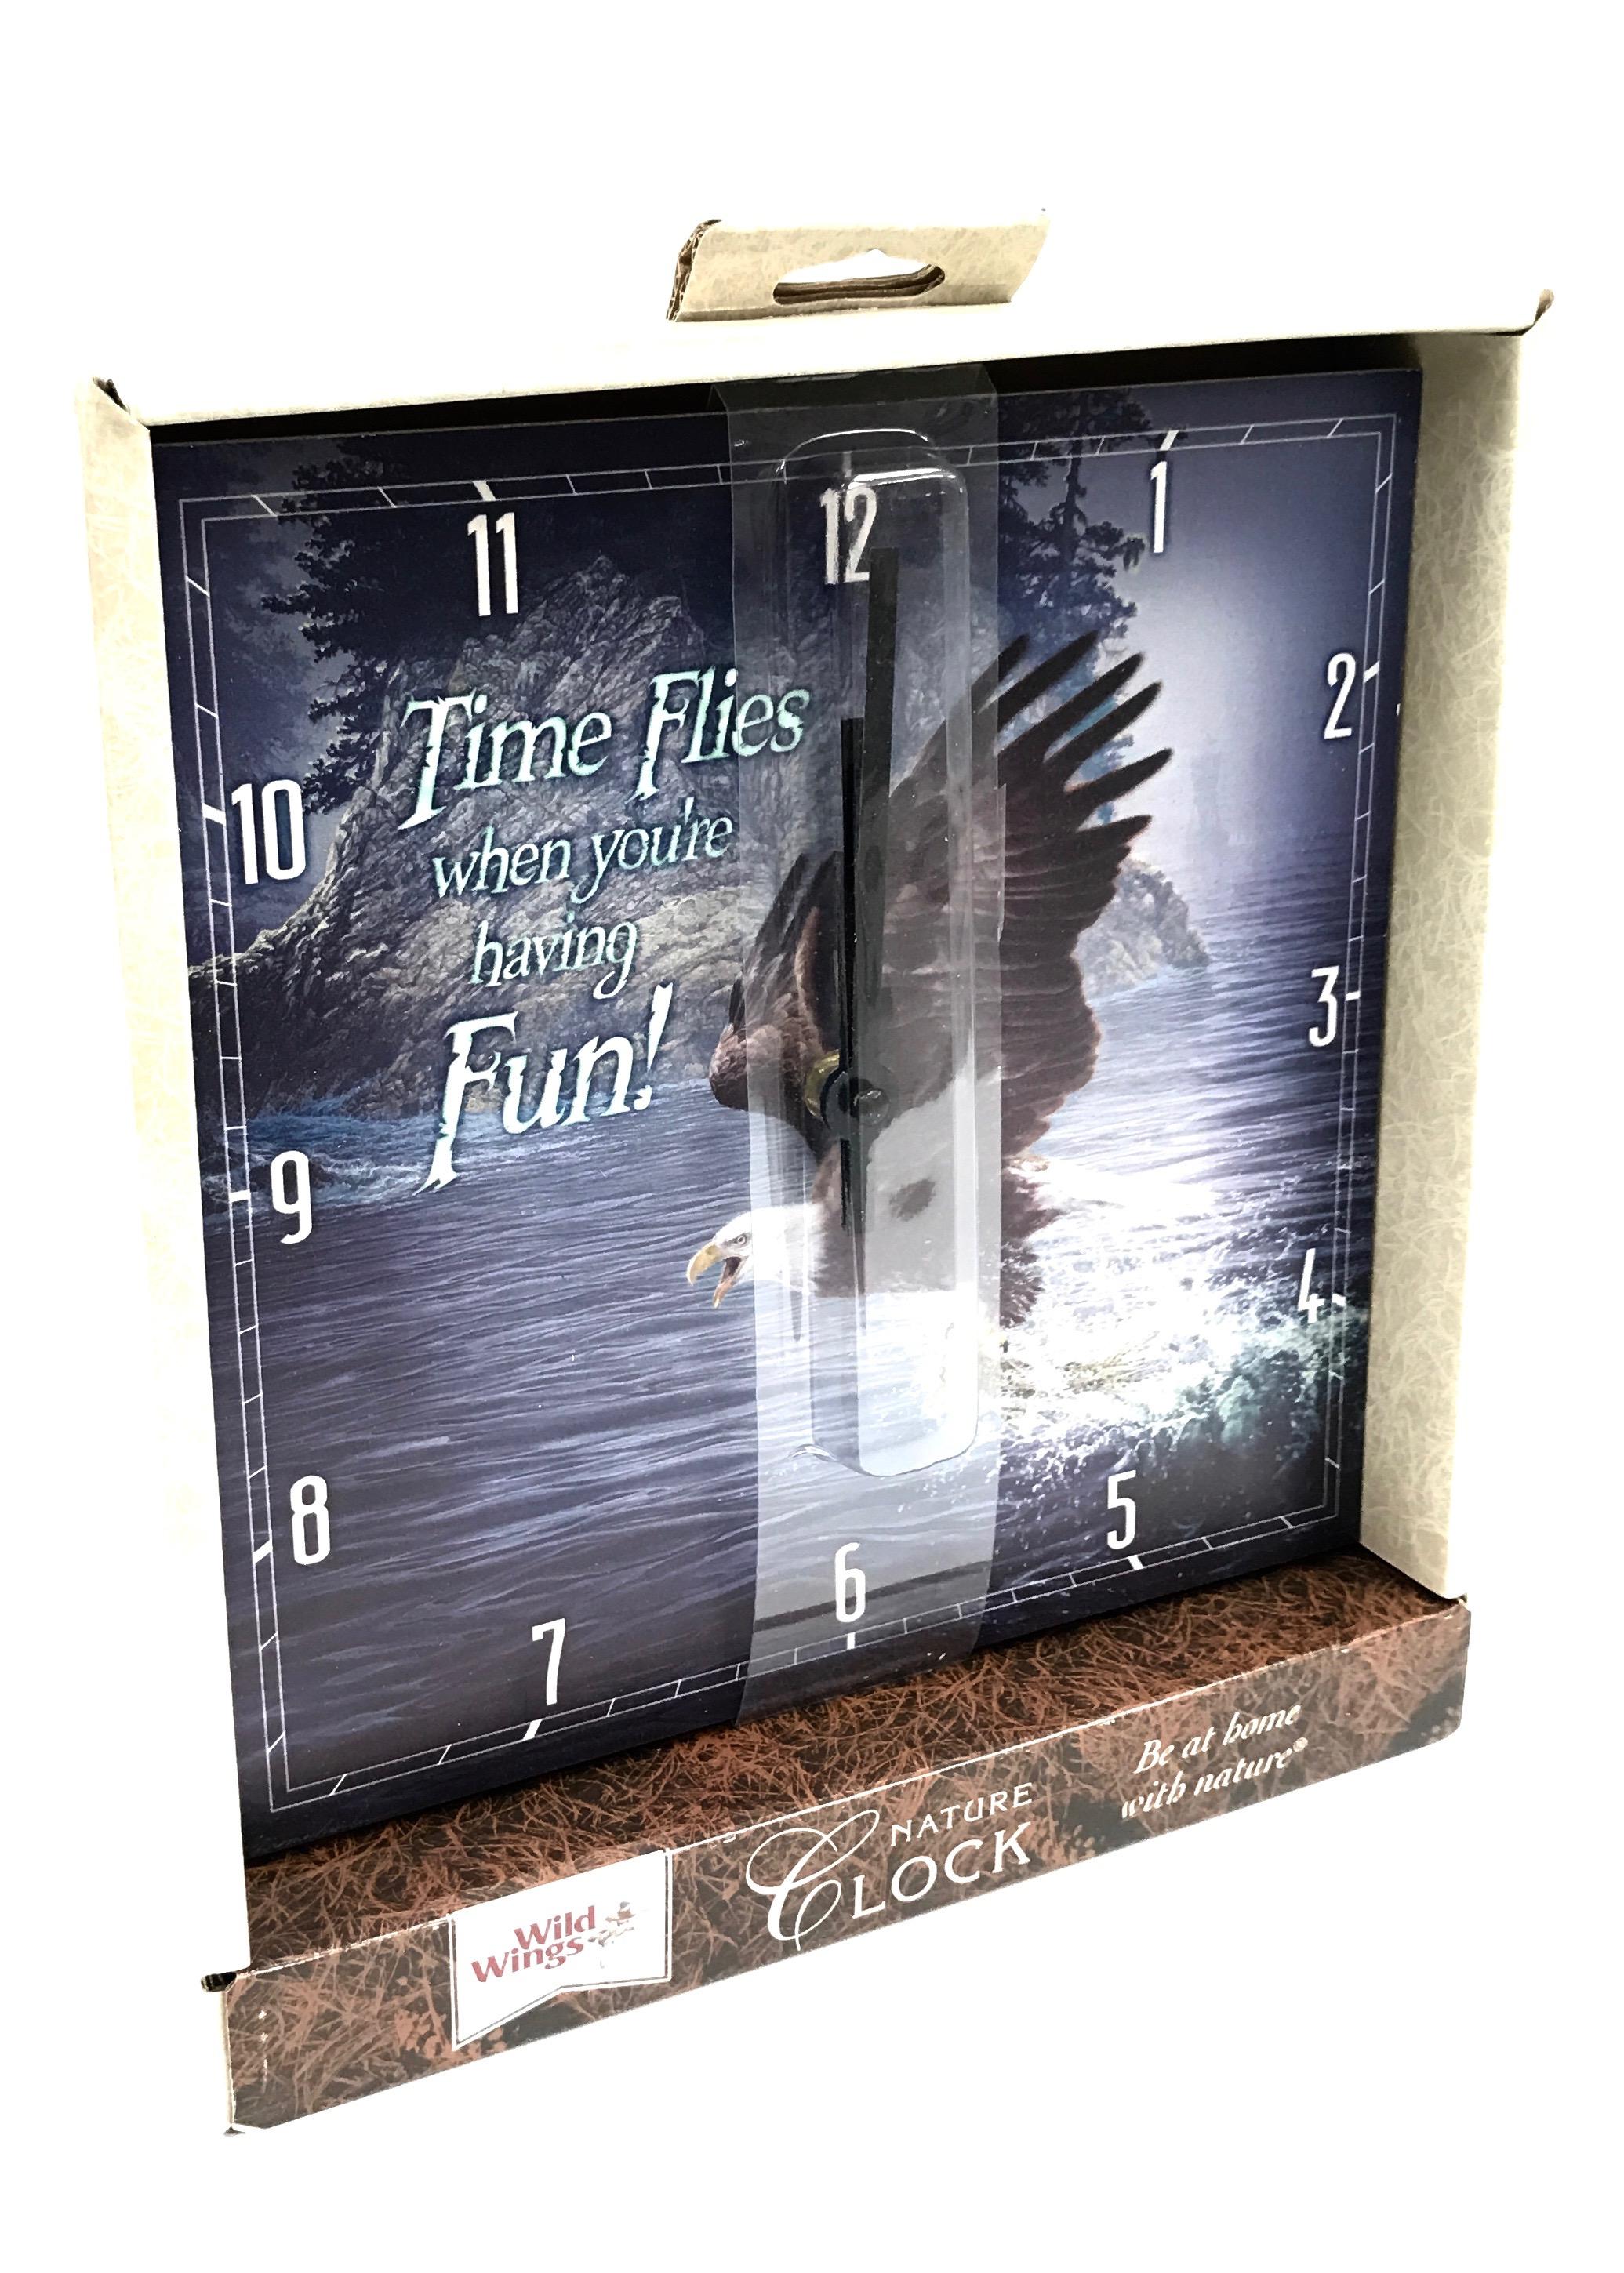 Canadian Wholesale Home Decor 10x10 Square Eagle Flies Clock Wg5842651032 4 95